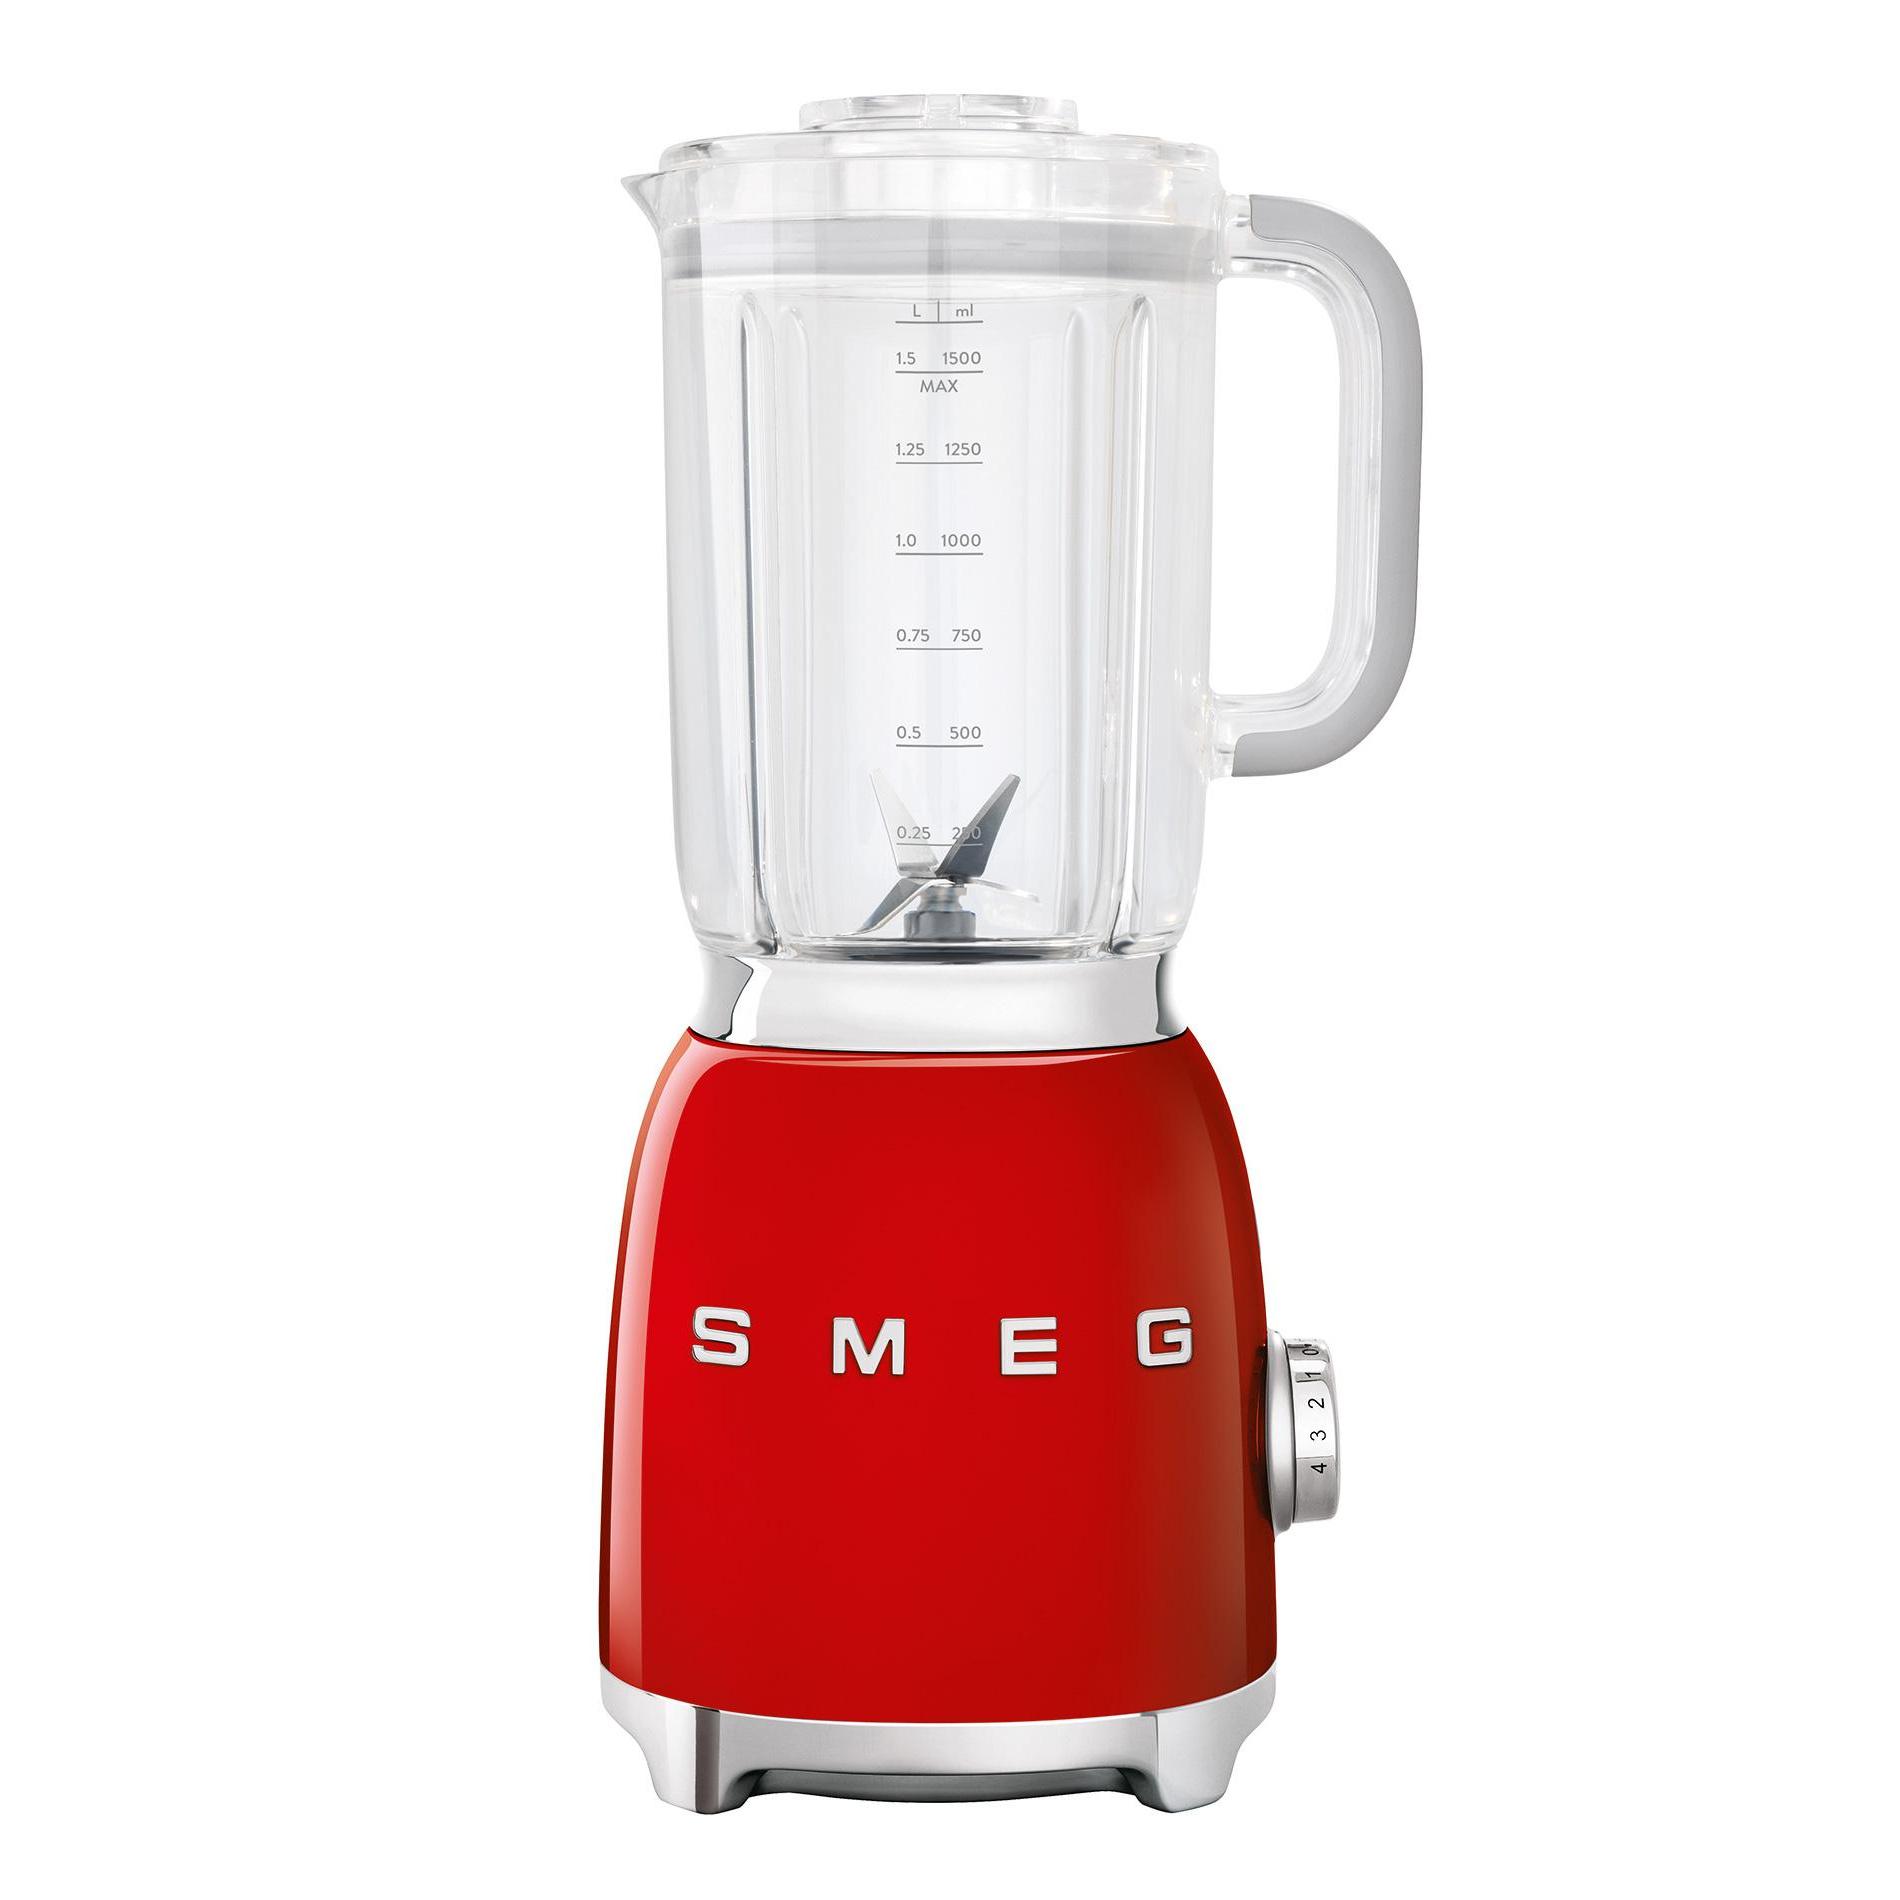 Smeg - BLF01 Standmixer 1|5L - rot/lackiert/BxHxT 16|3x39|7x19|7cm | Küche und Esszimmer > Küchengeräte | Smeg